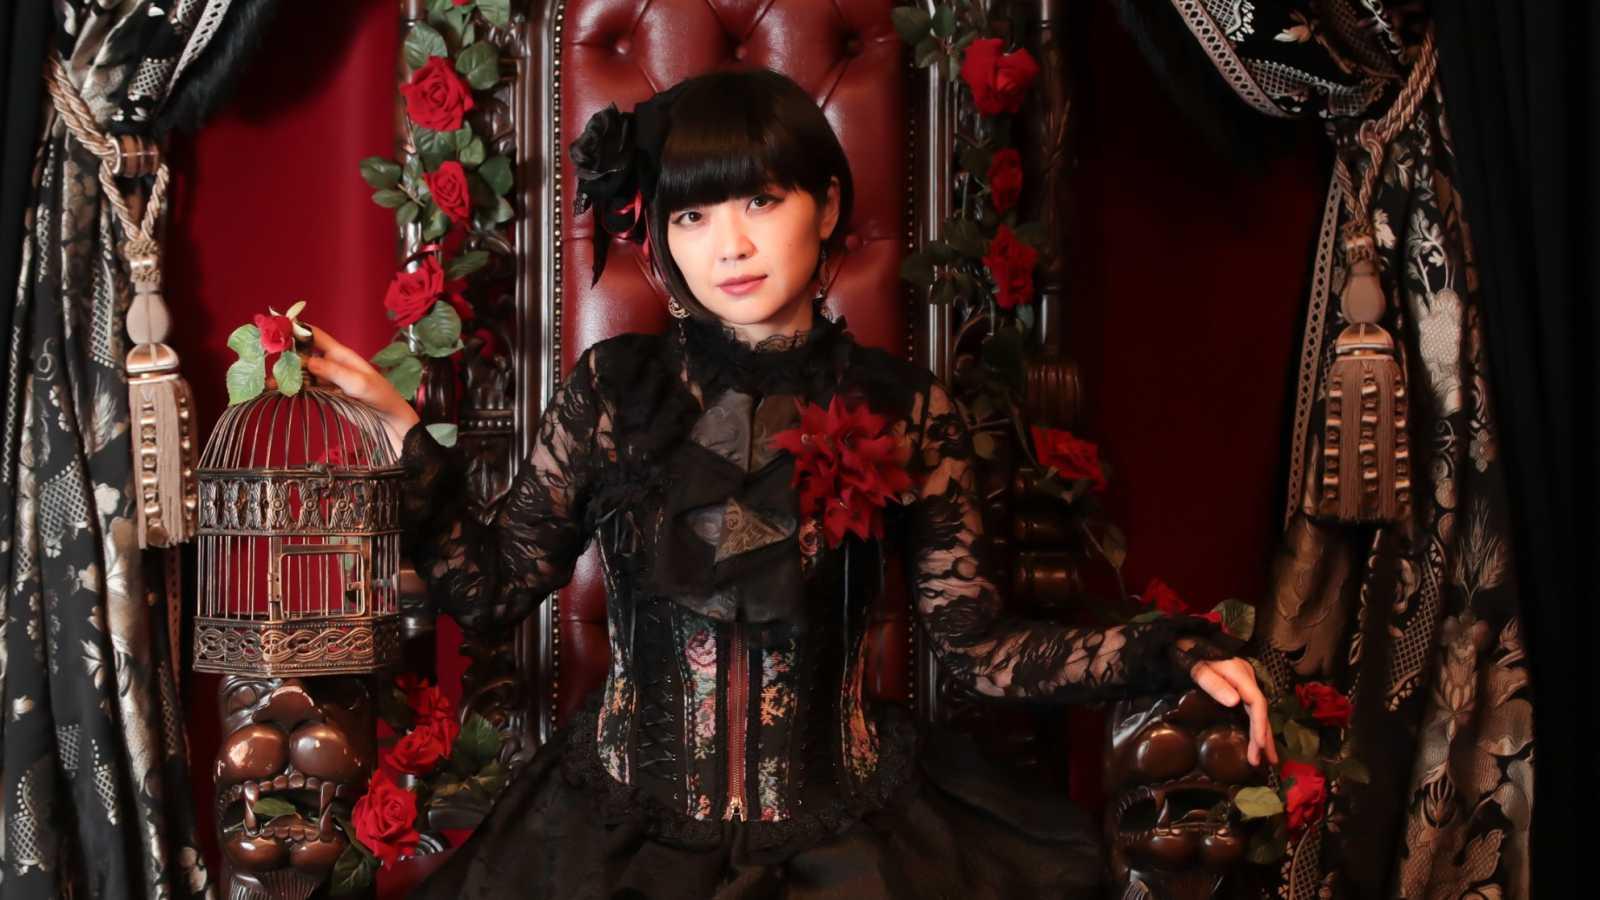 Mika Kobayashi Announces July Live Stream © Mika Kobayashi. All rights reserved.